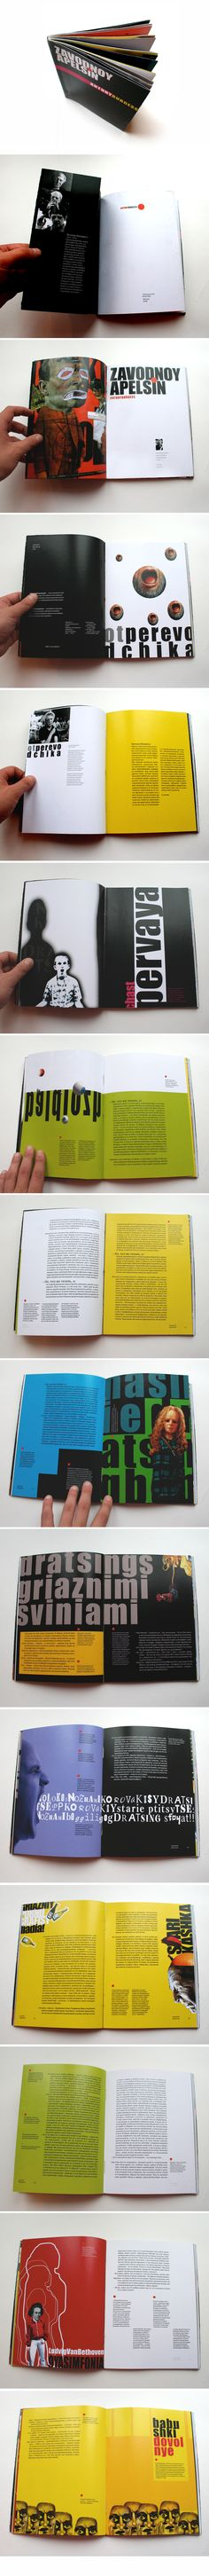 """A Clockwork Orange"" by Anthony Burgess (Part 1) Book Design 2008  maximdesigner.com"